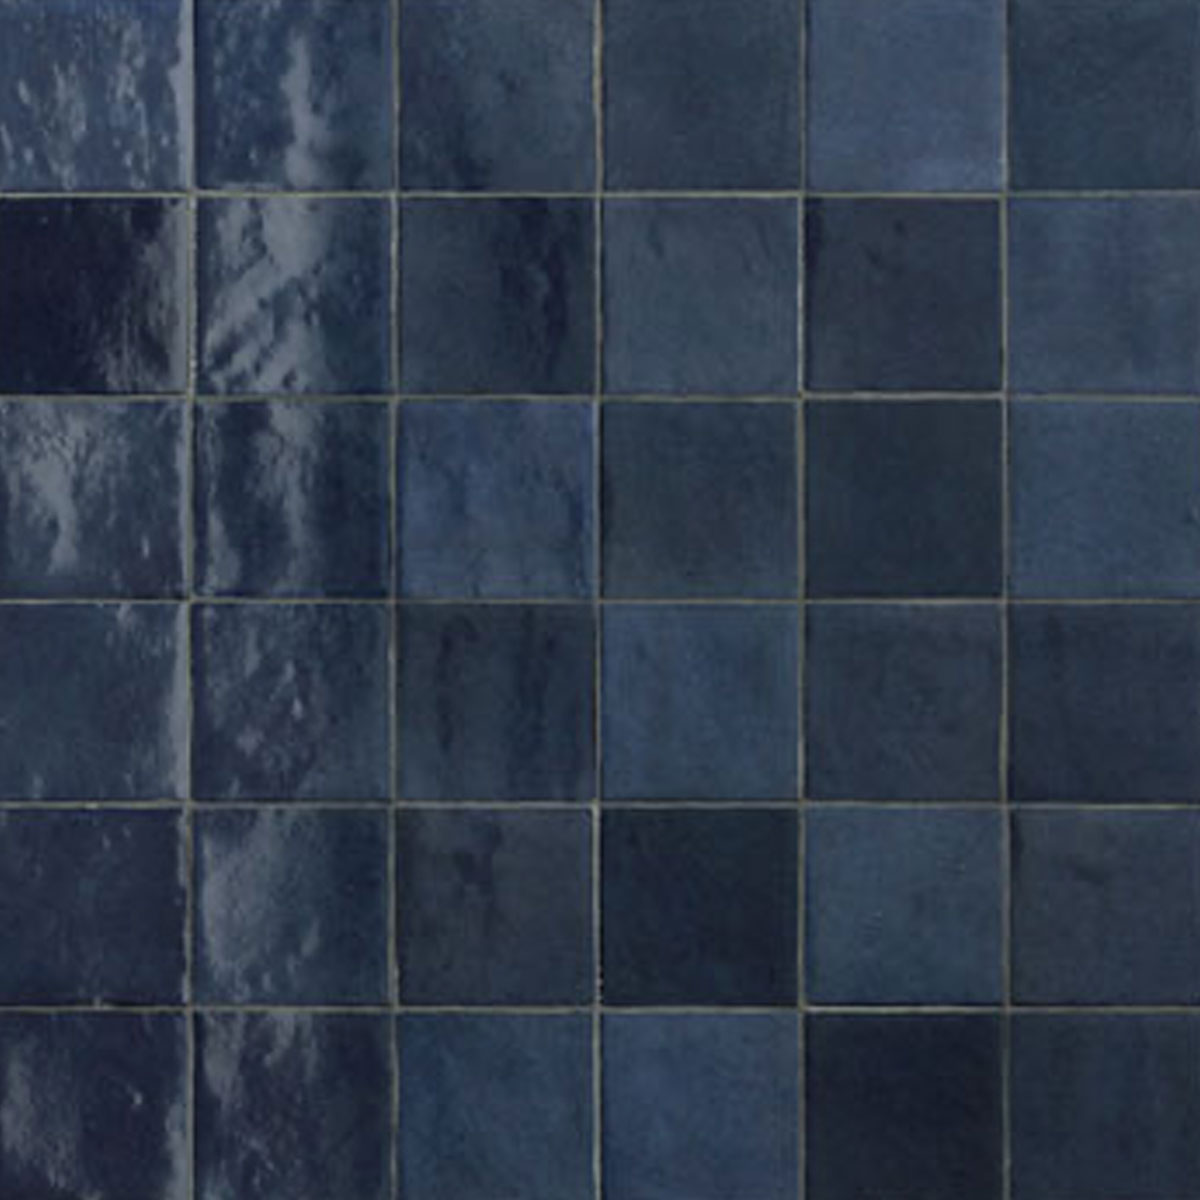 Zellige - China - Handmade Look Tiles - Stone3 Brisbane